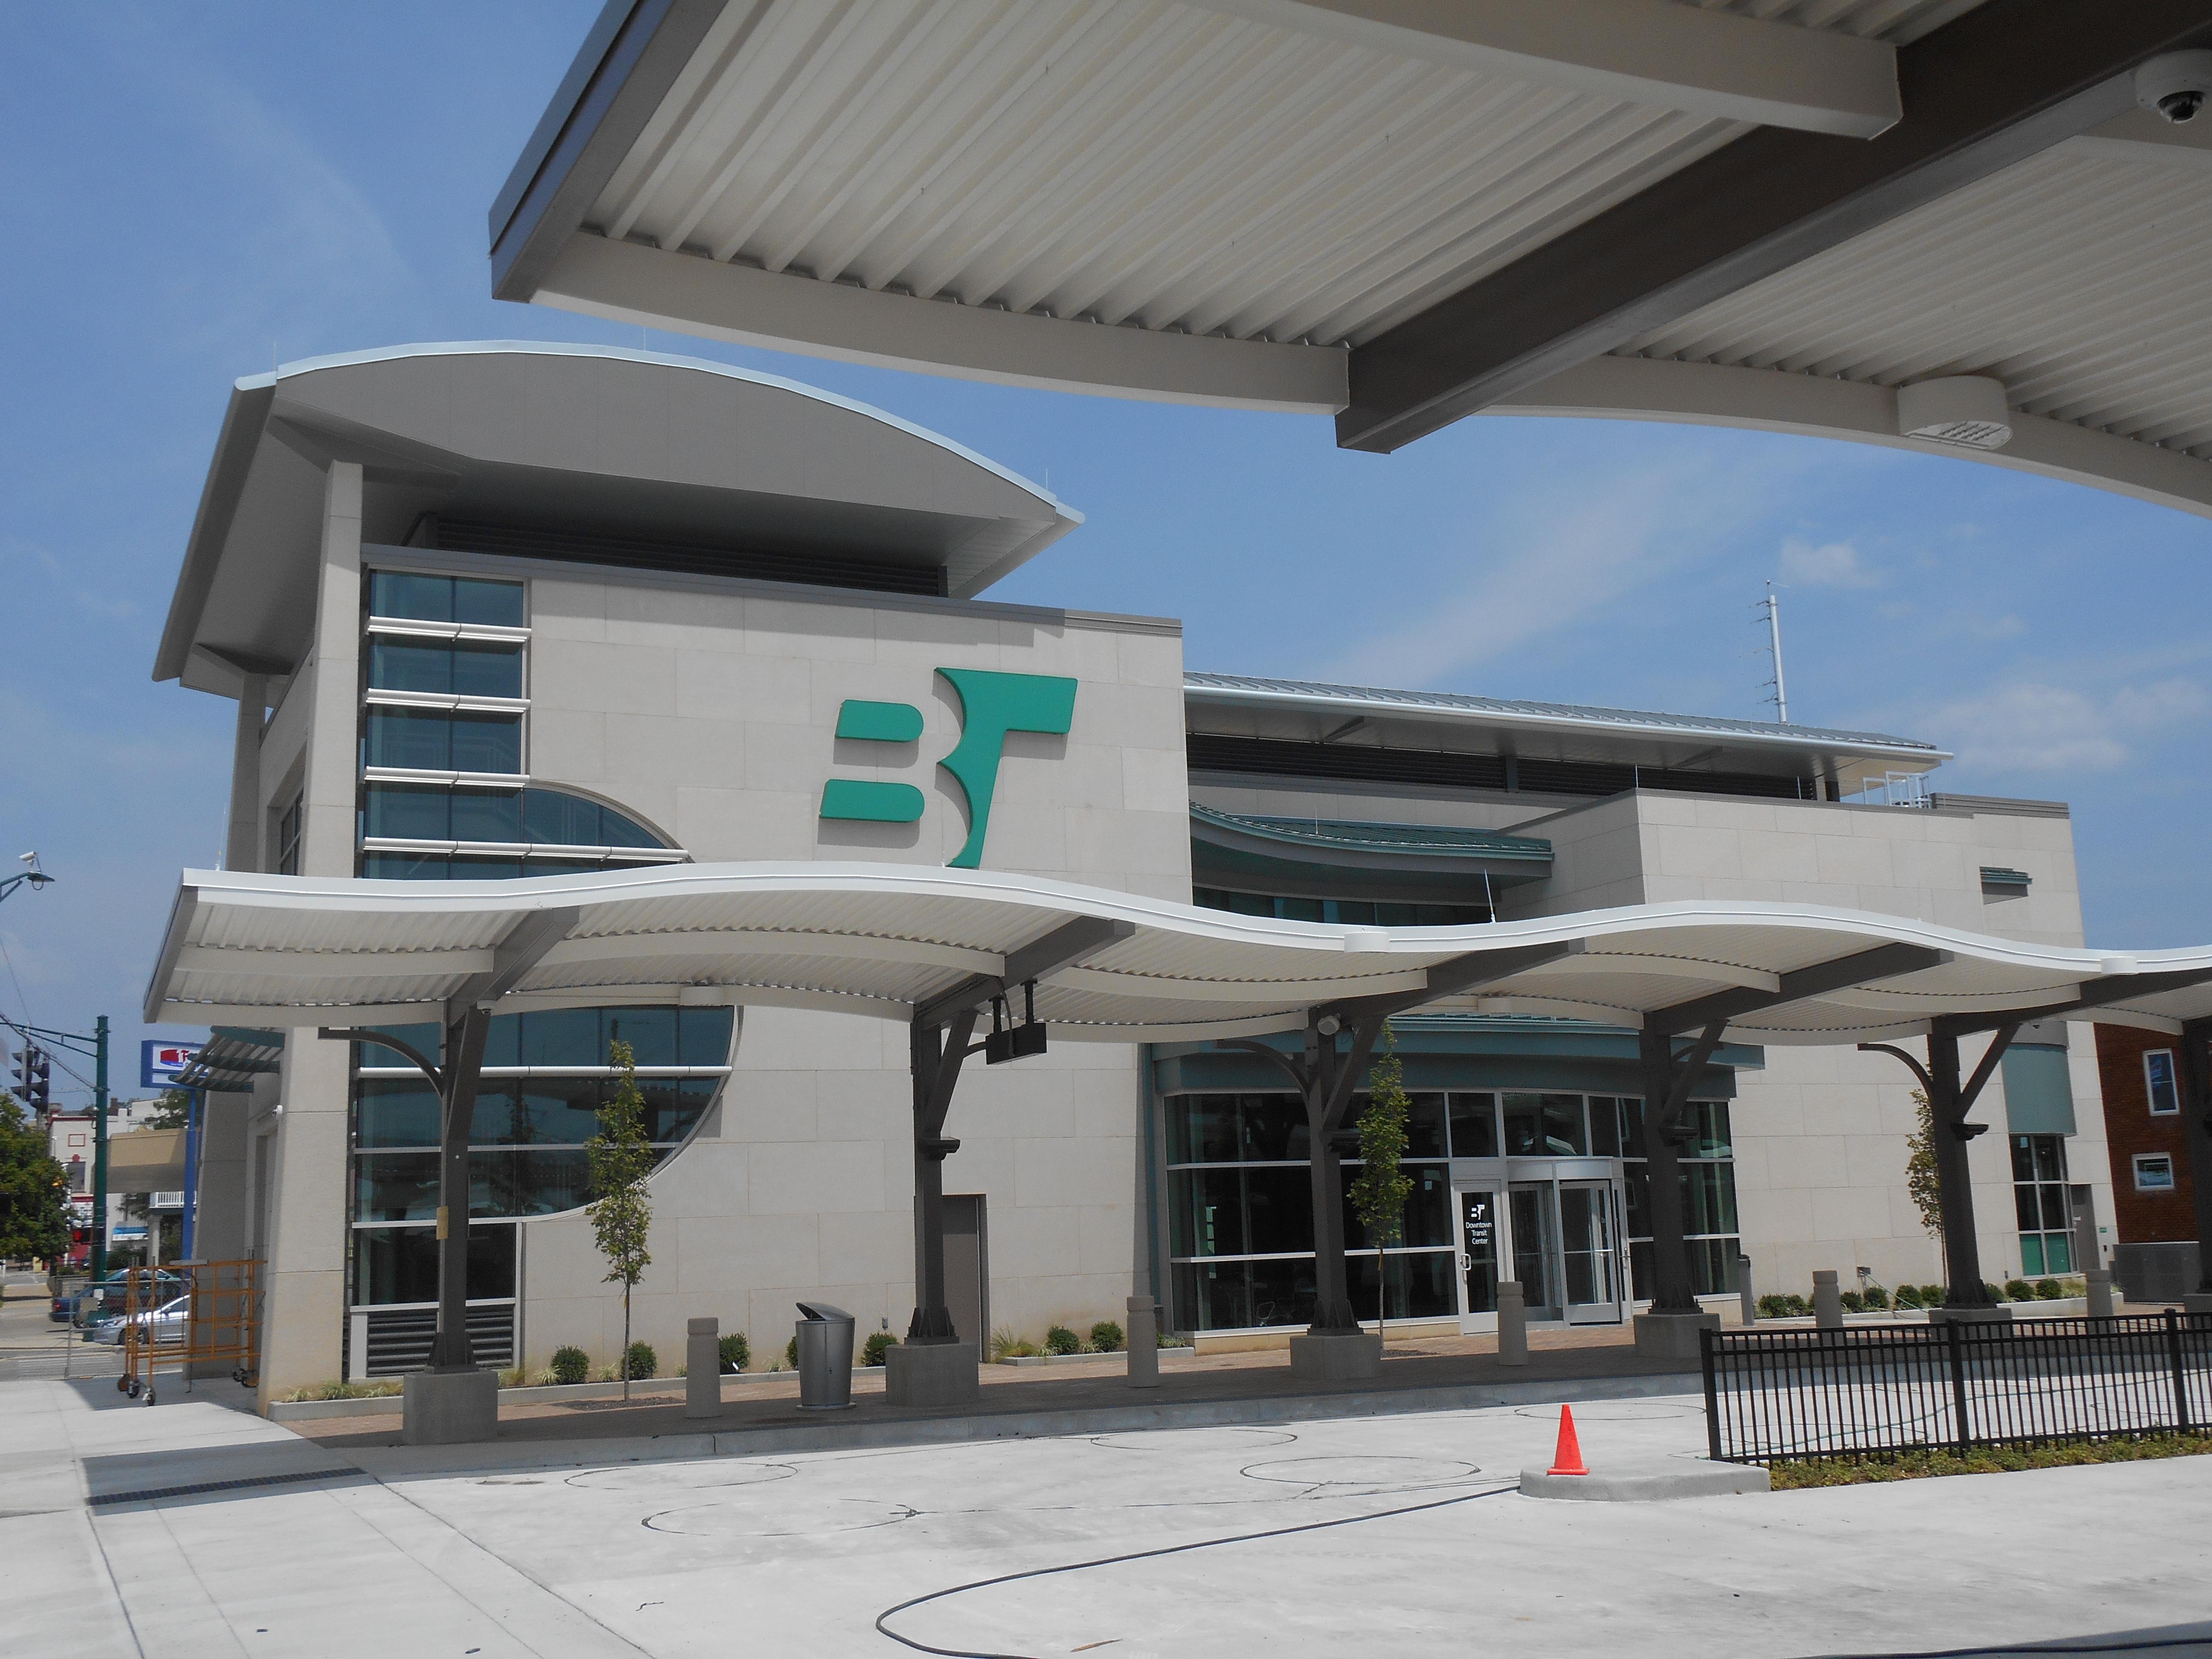 Transit Center 8-4-14 019